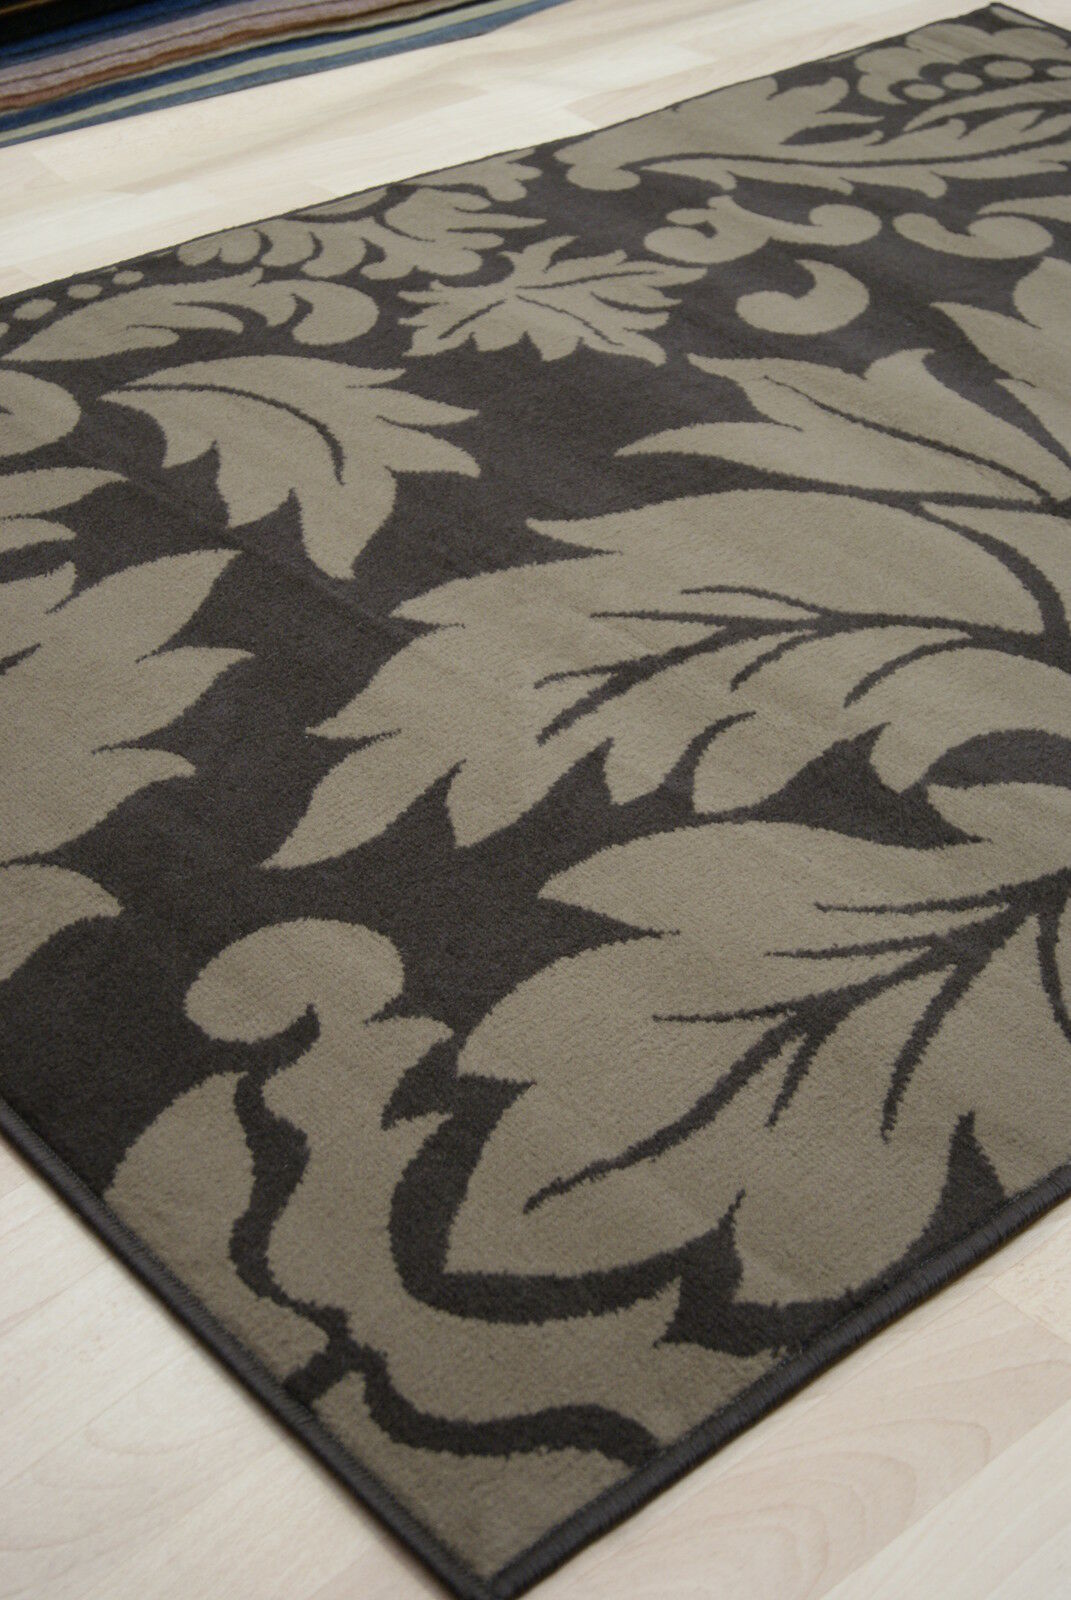 Bilancio economico CIOCCOLATO & Marronee DAMASCATO Modern Medium Large Tappeto 160x230 cm